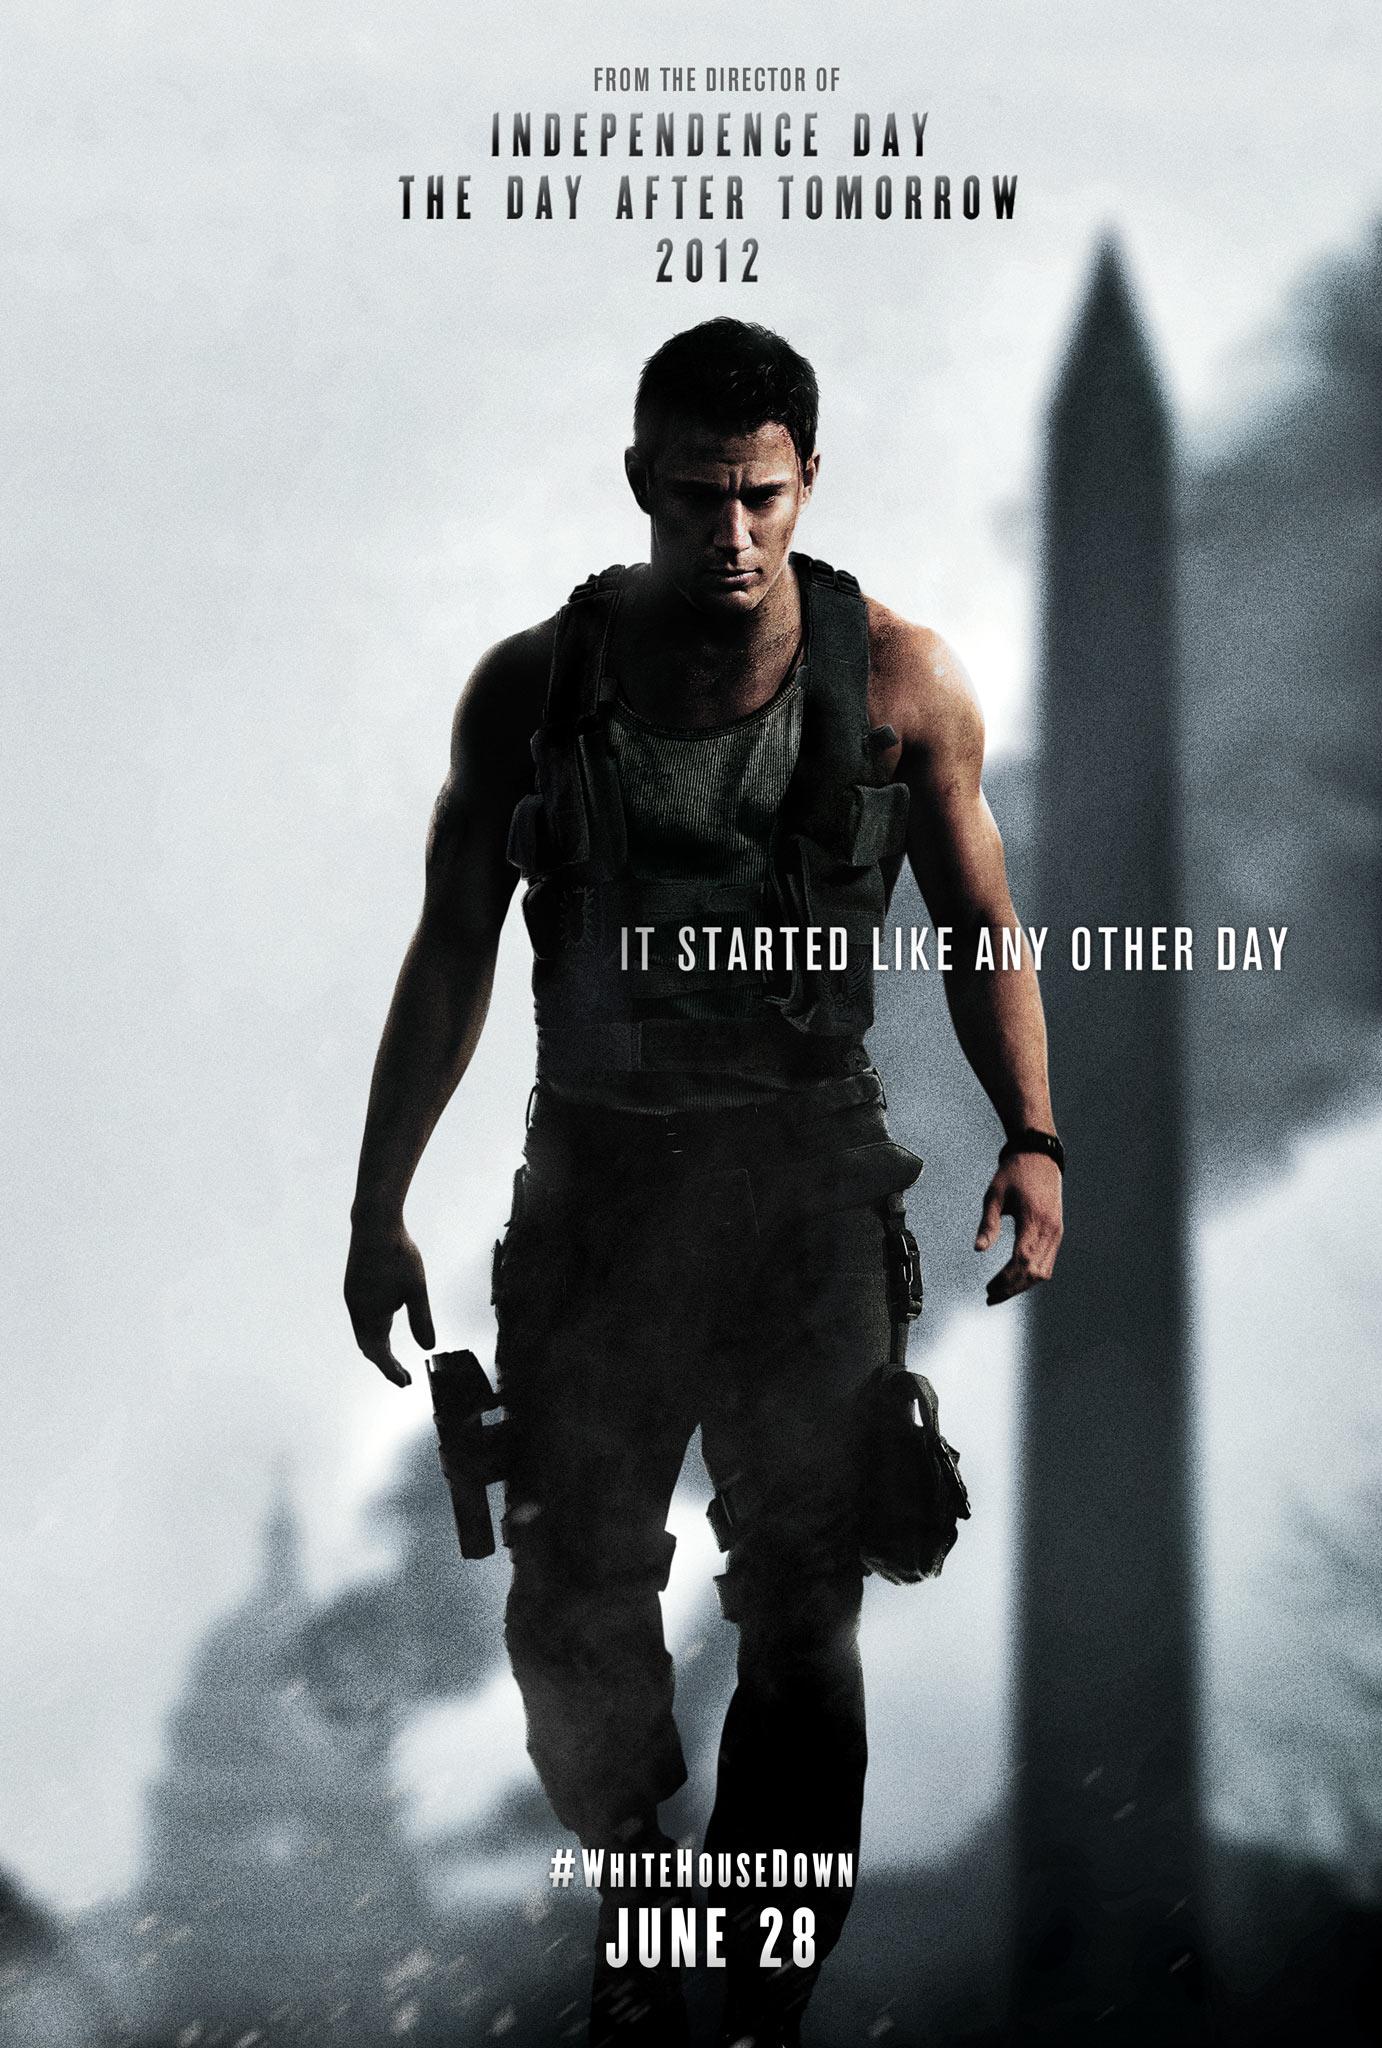 White House Down - Movie Poster #1 (Original)